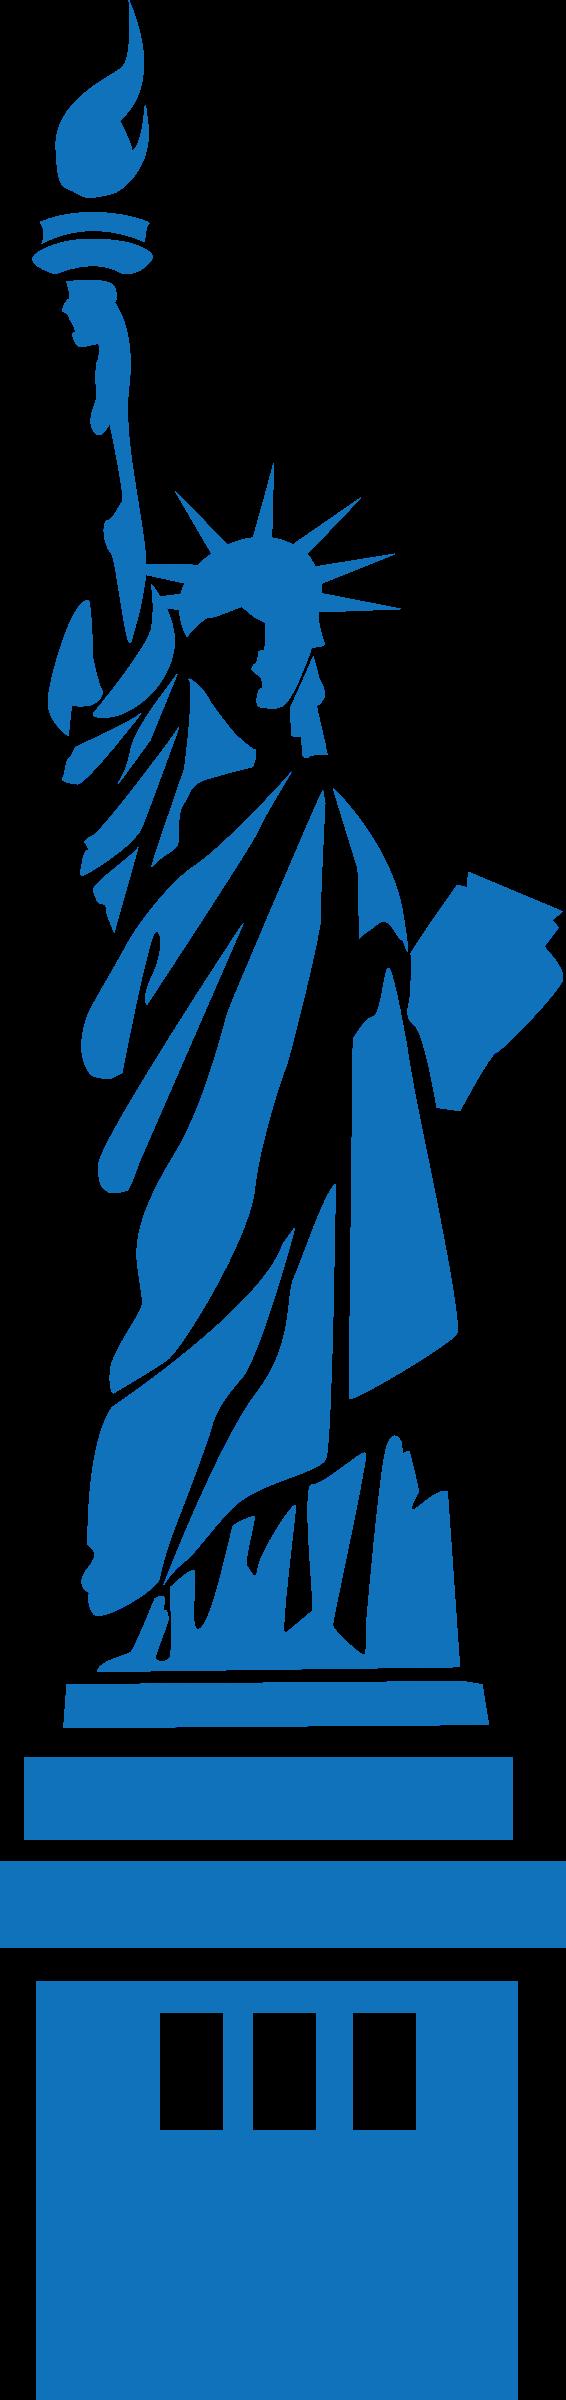 clipart new york statue of liberty taj mahal clipart taj mahal clipart black